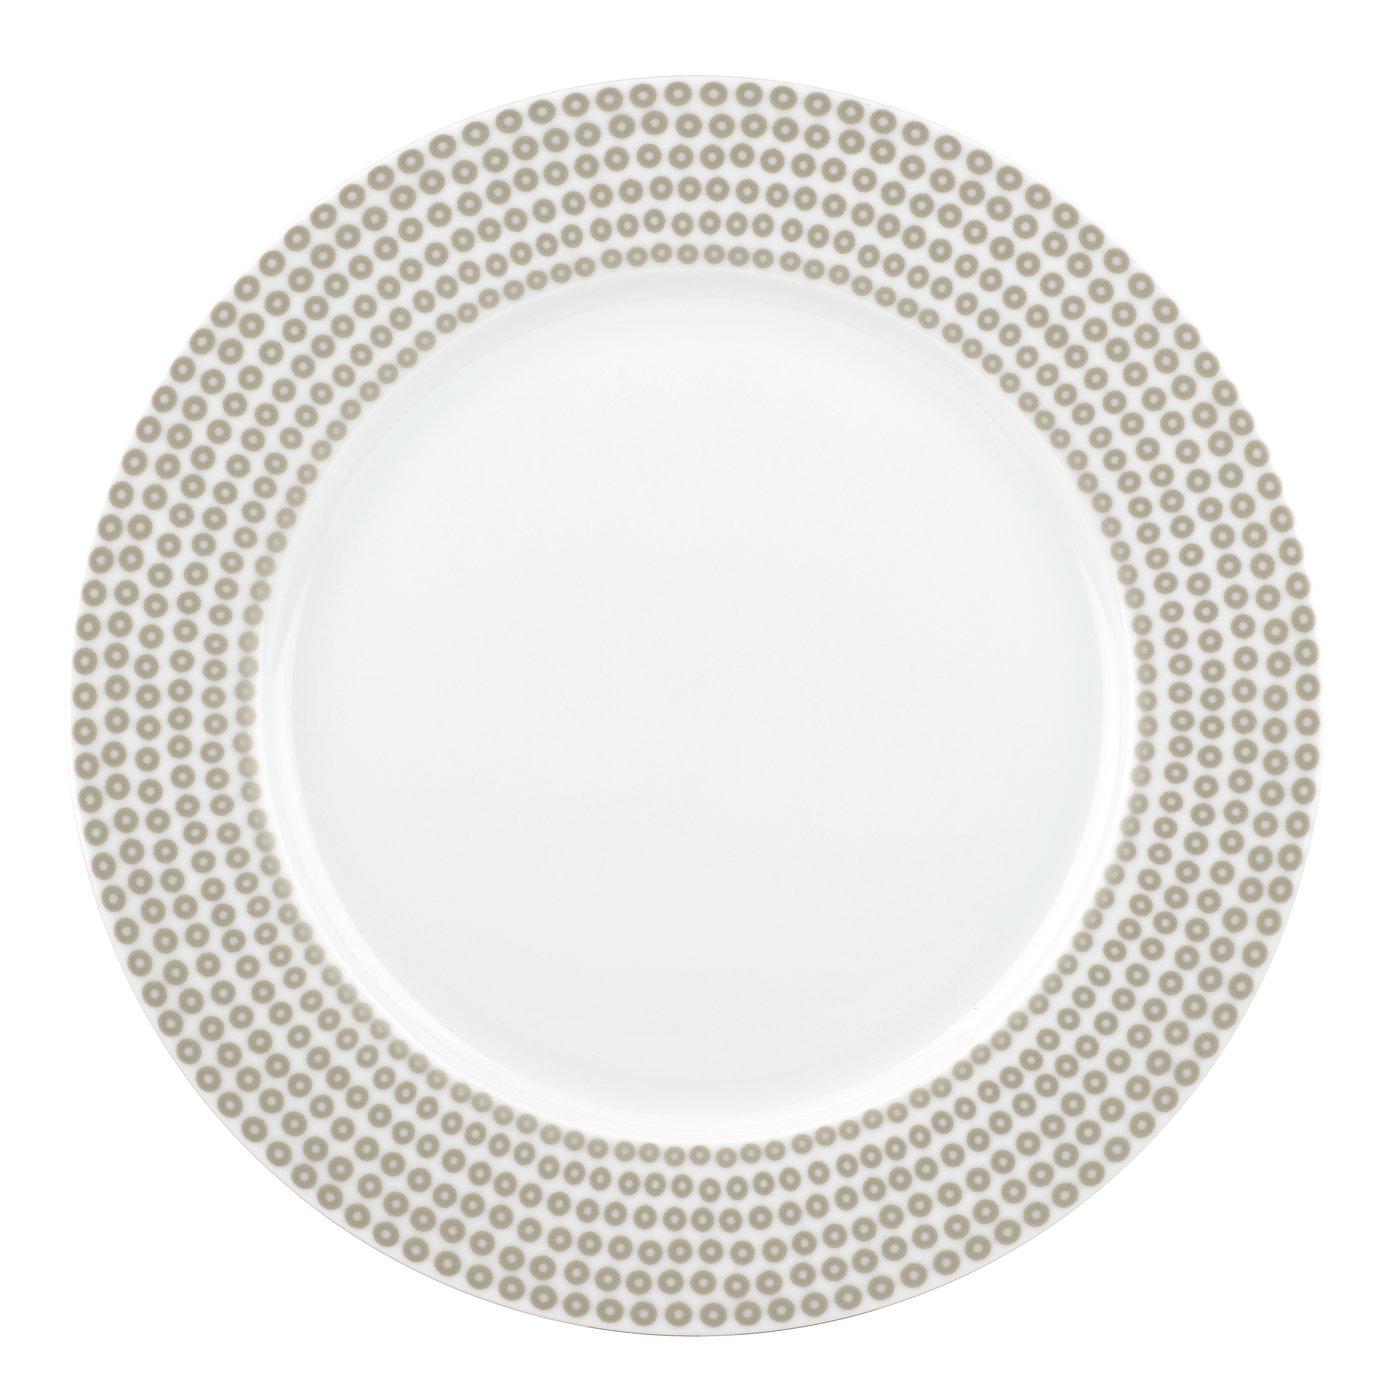 Studio Glamour Sequin (Silver)